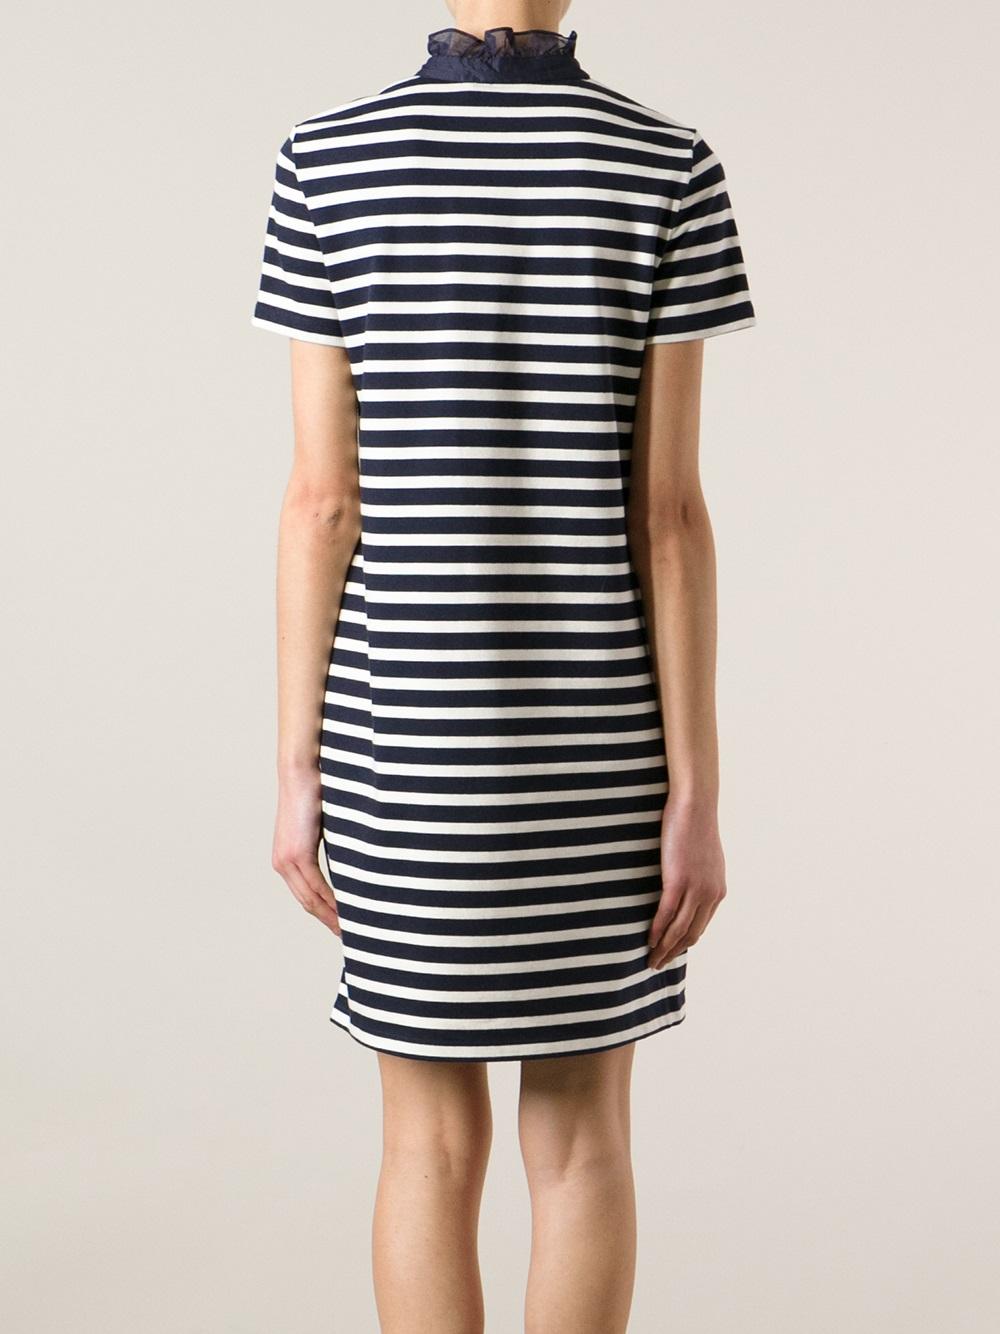 Lyst tory burch striped tshirt dress in blue for Tory burch t shirt